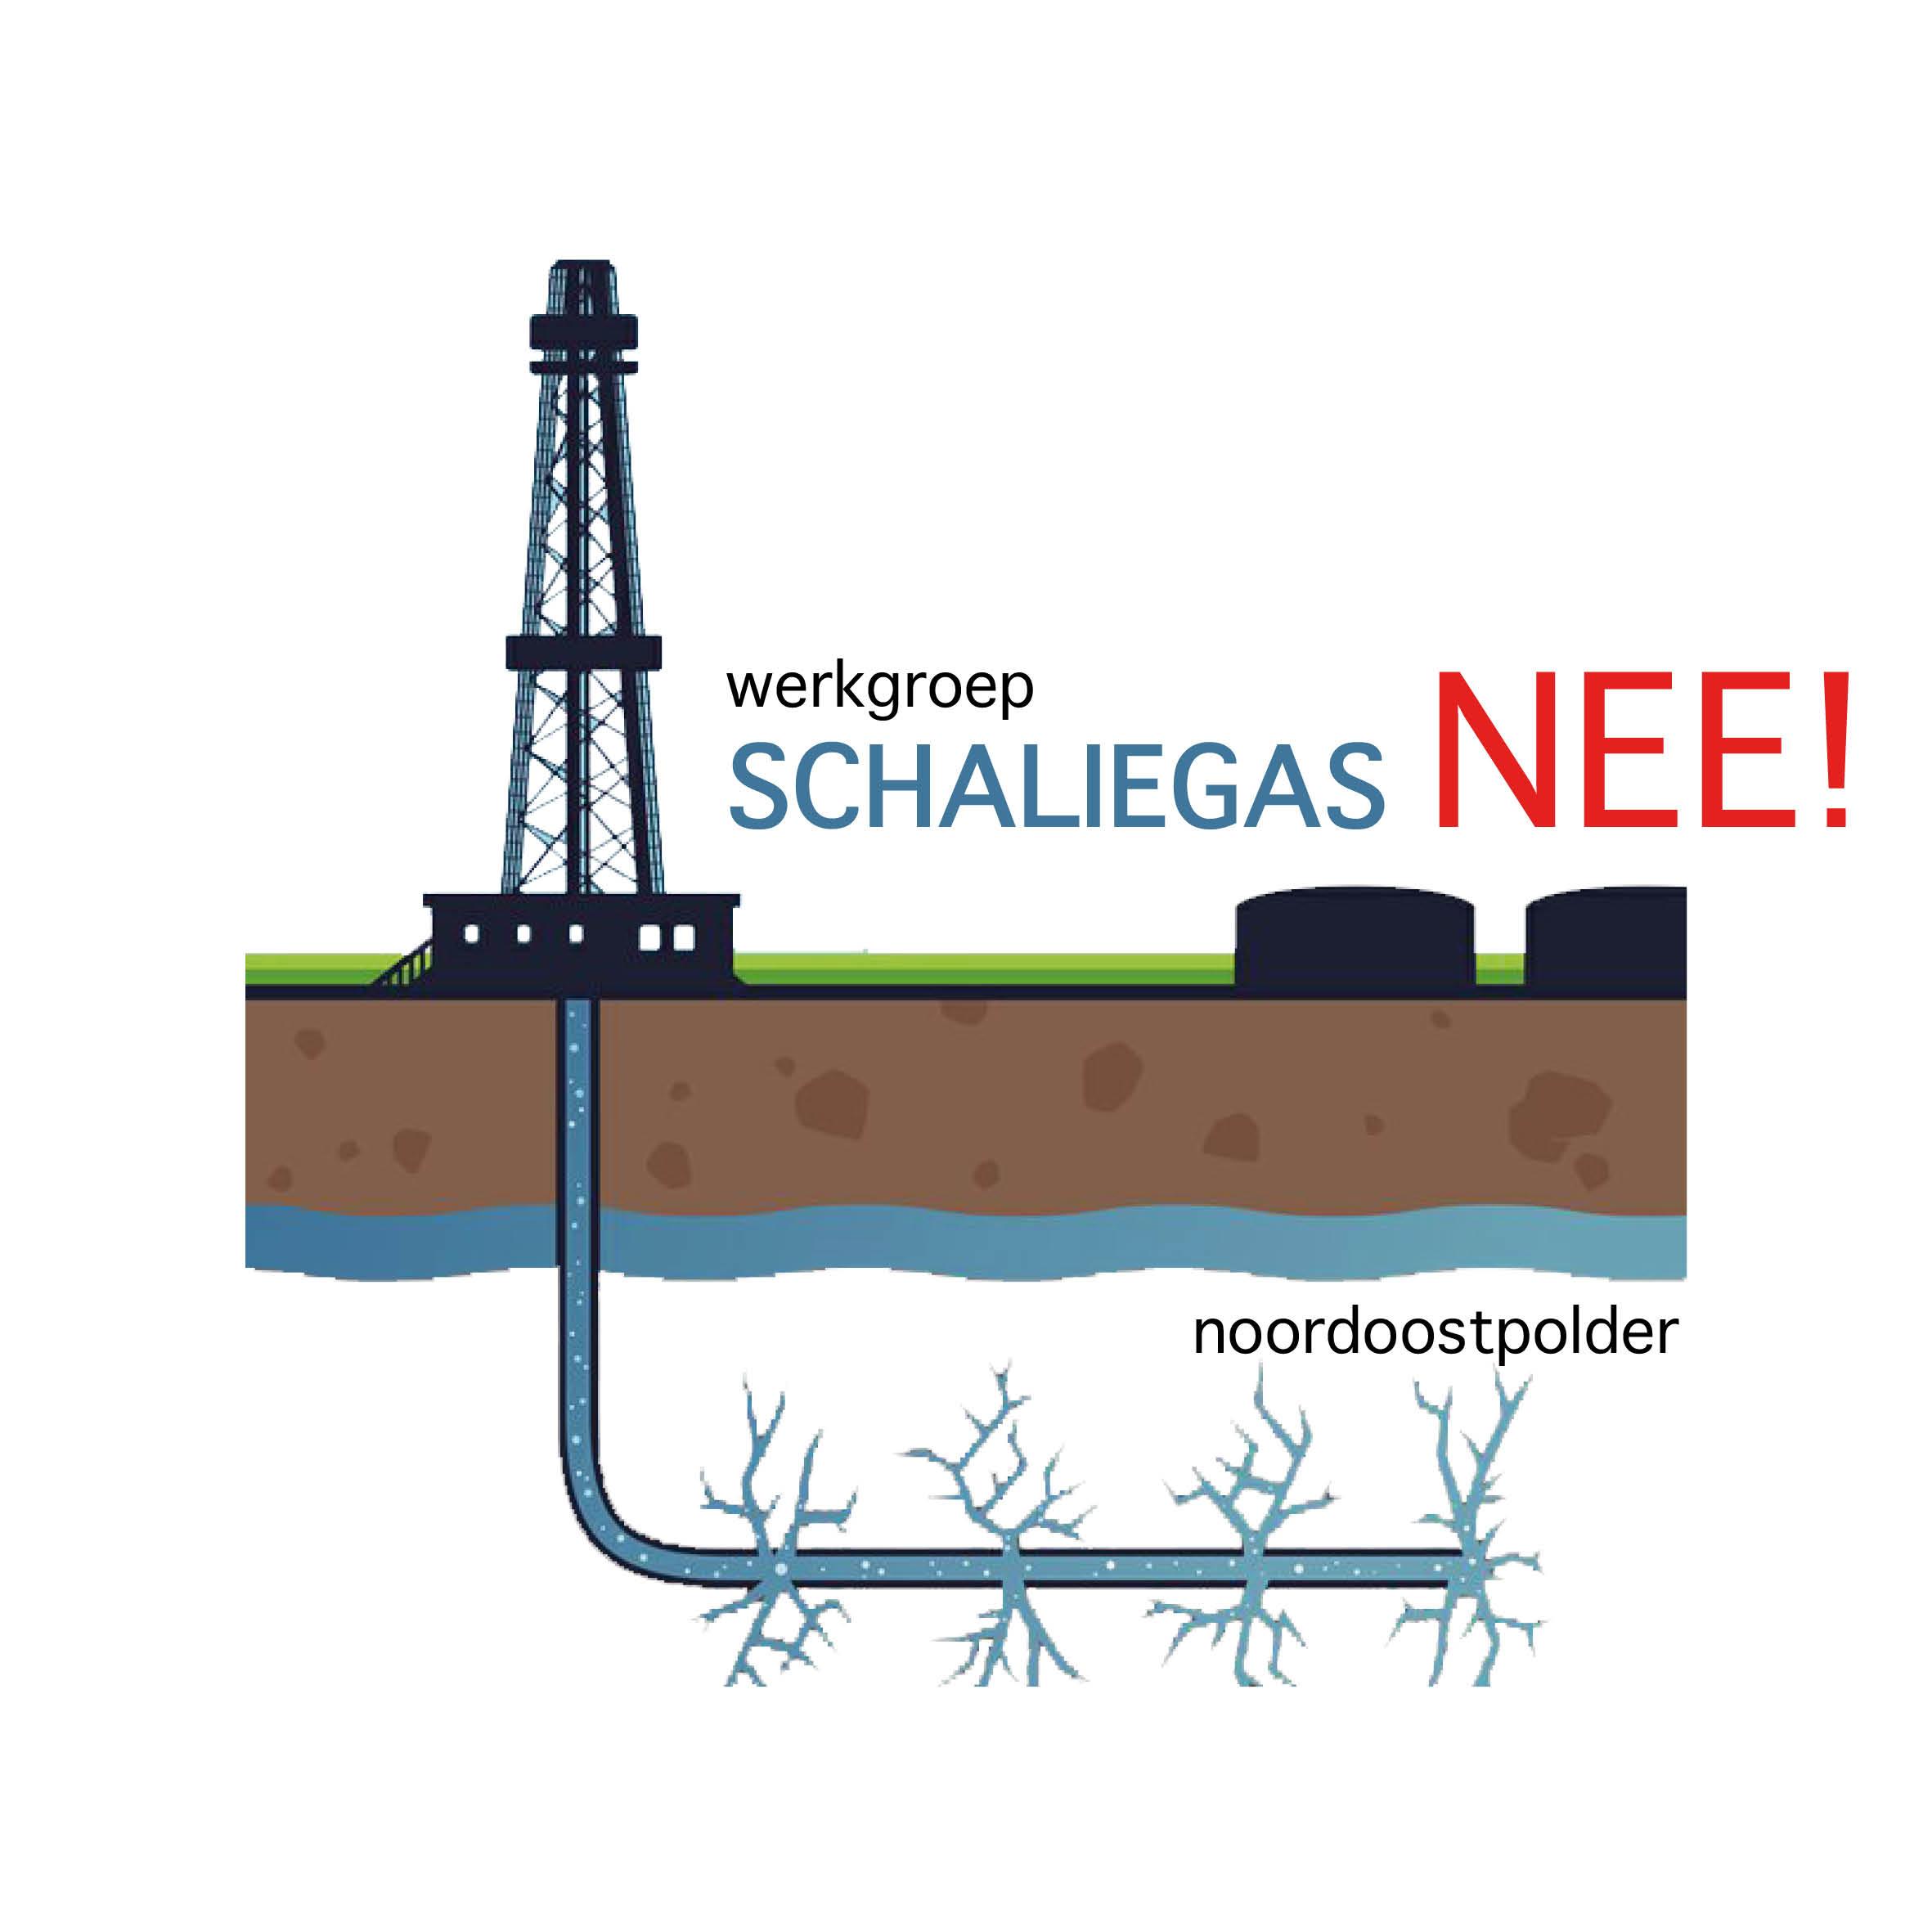 werkgroep-Schaliegas-Nee